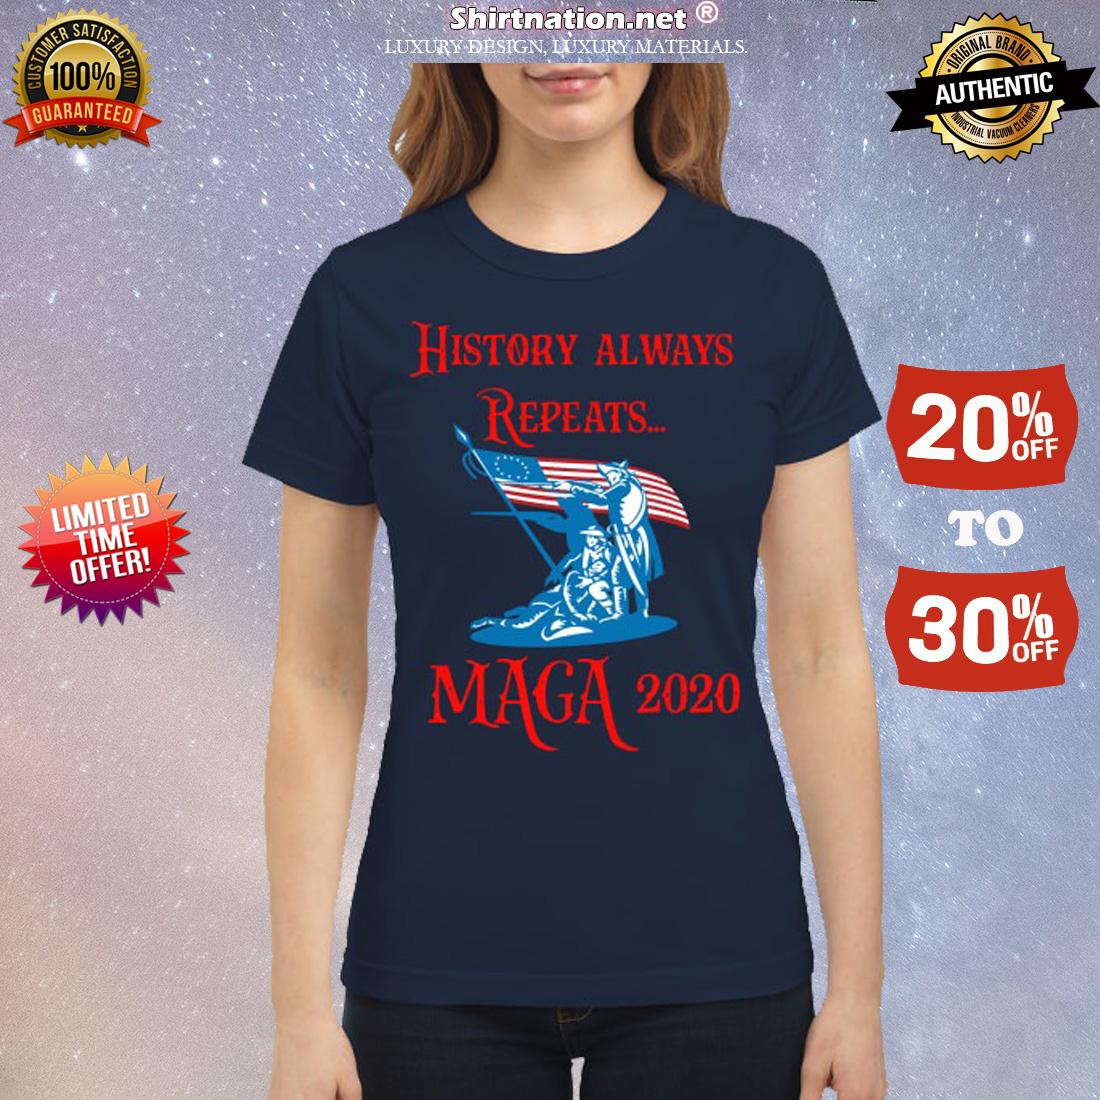 History always repeats Maga 2020 classic shirt